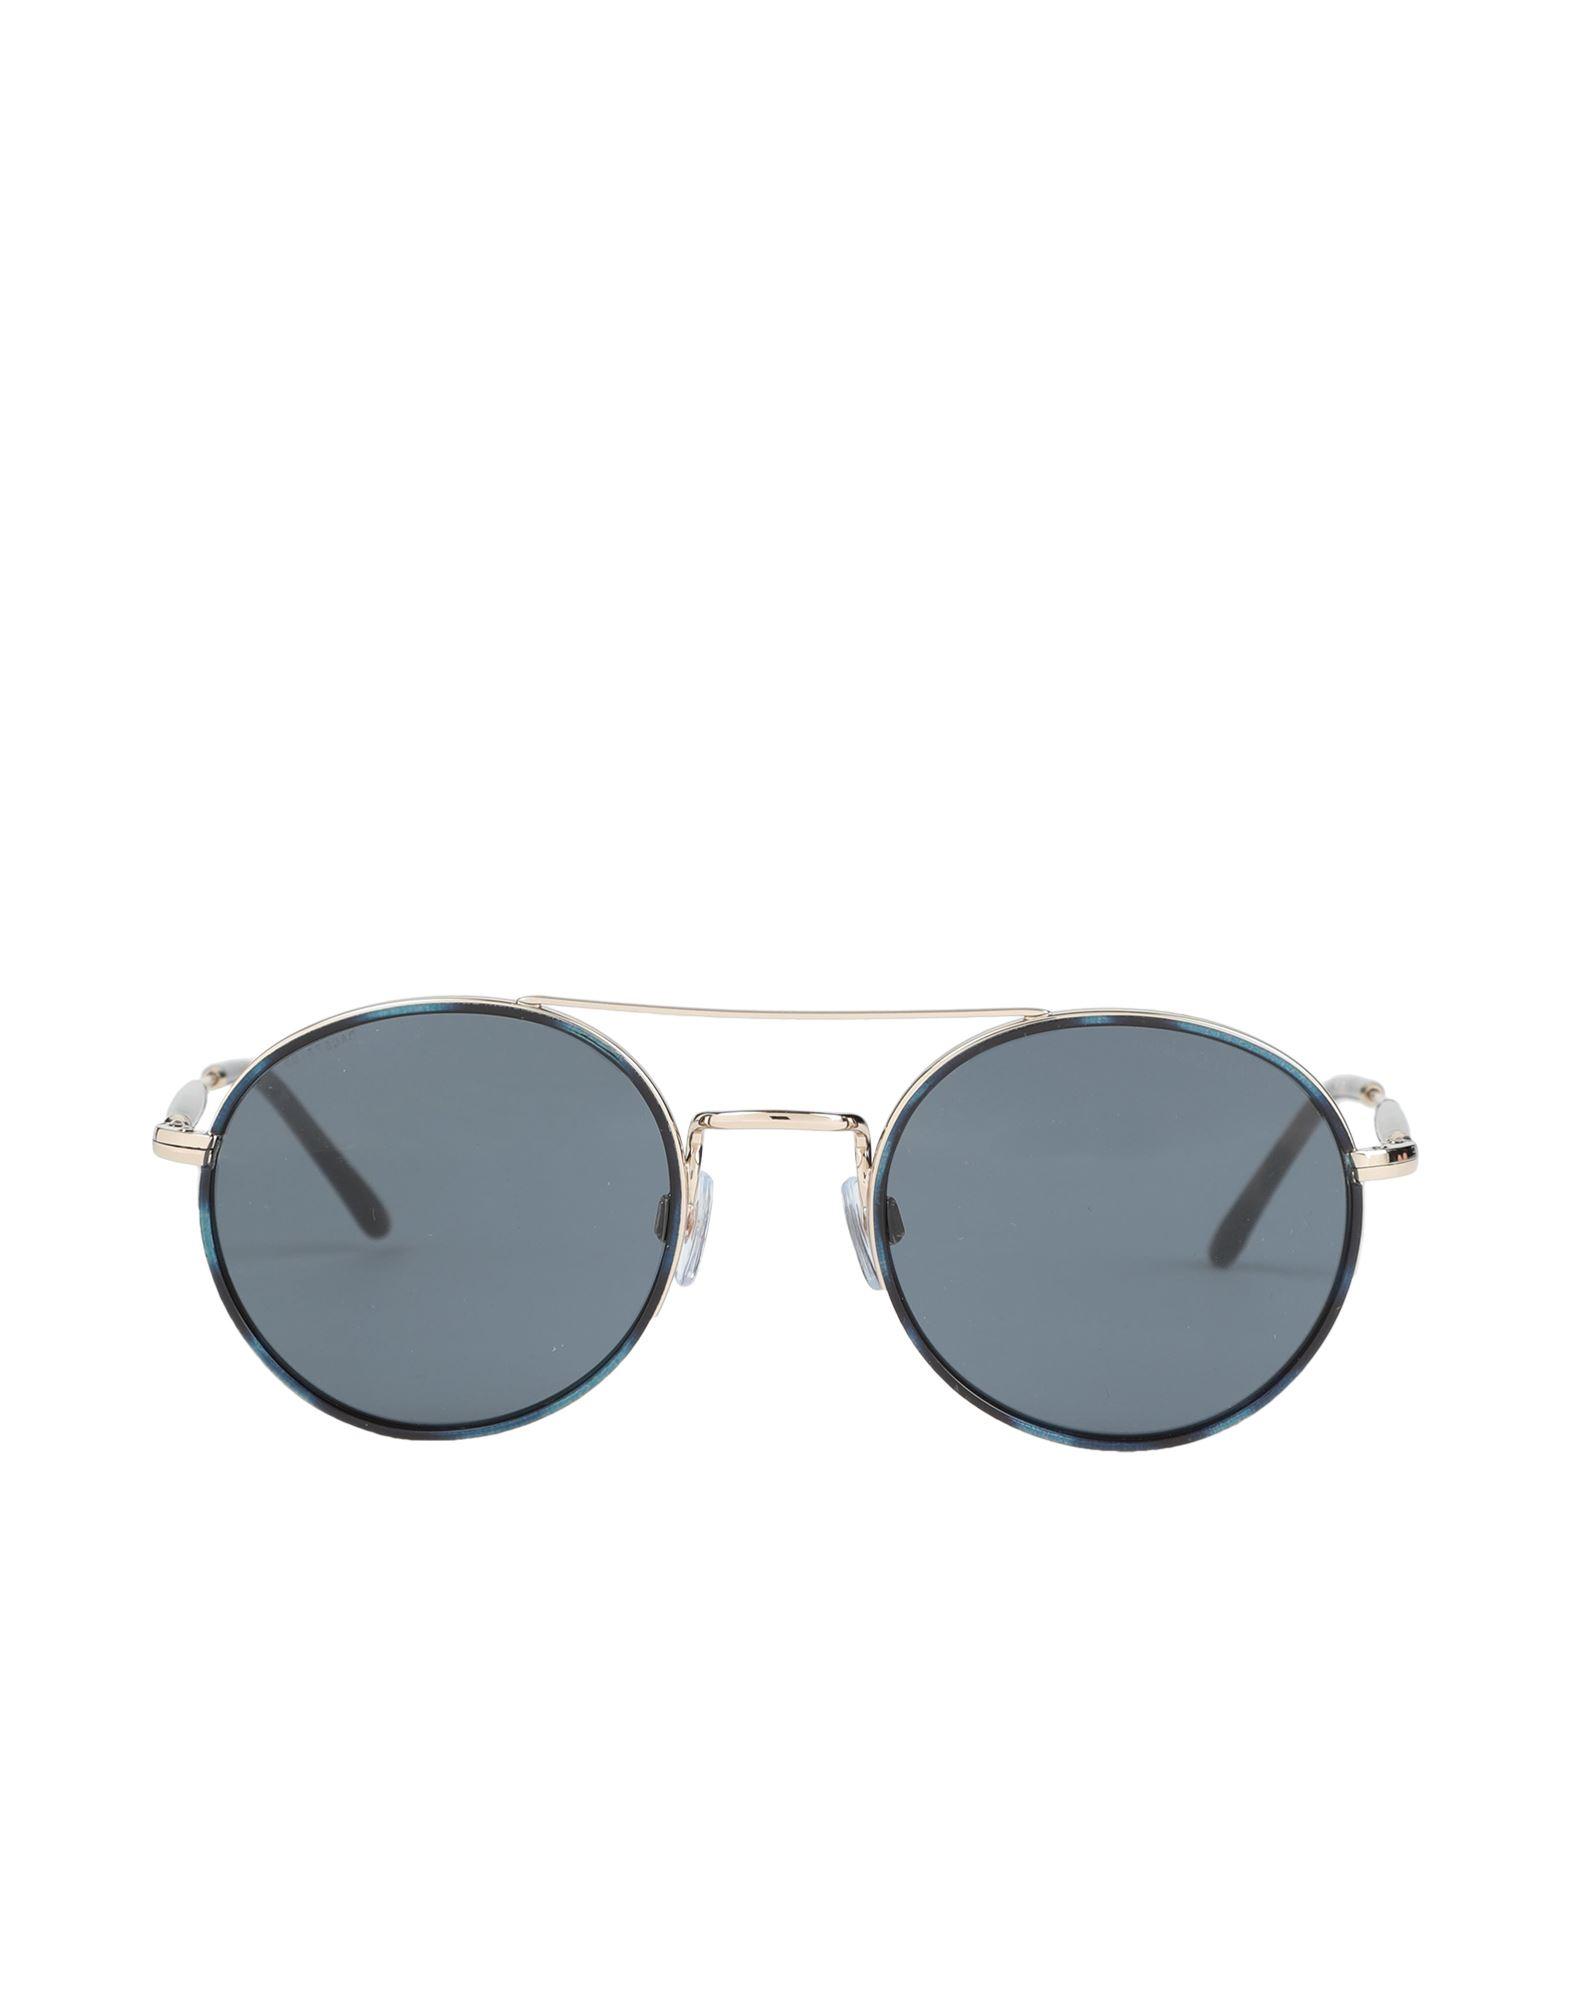 GIORGIO ARMANI Sunglasses - Item 46737652